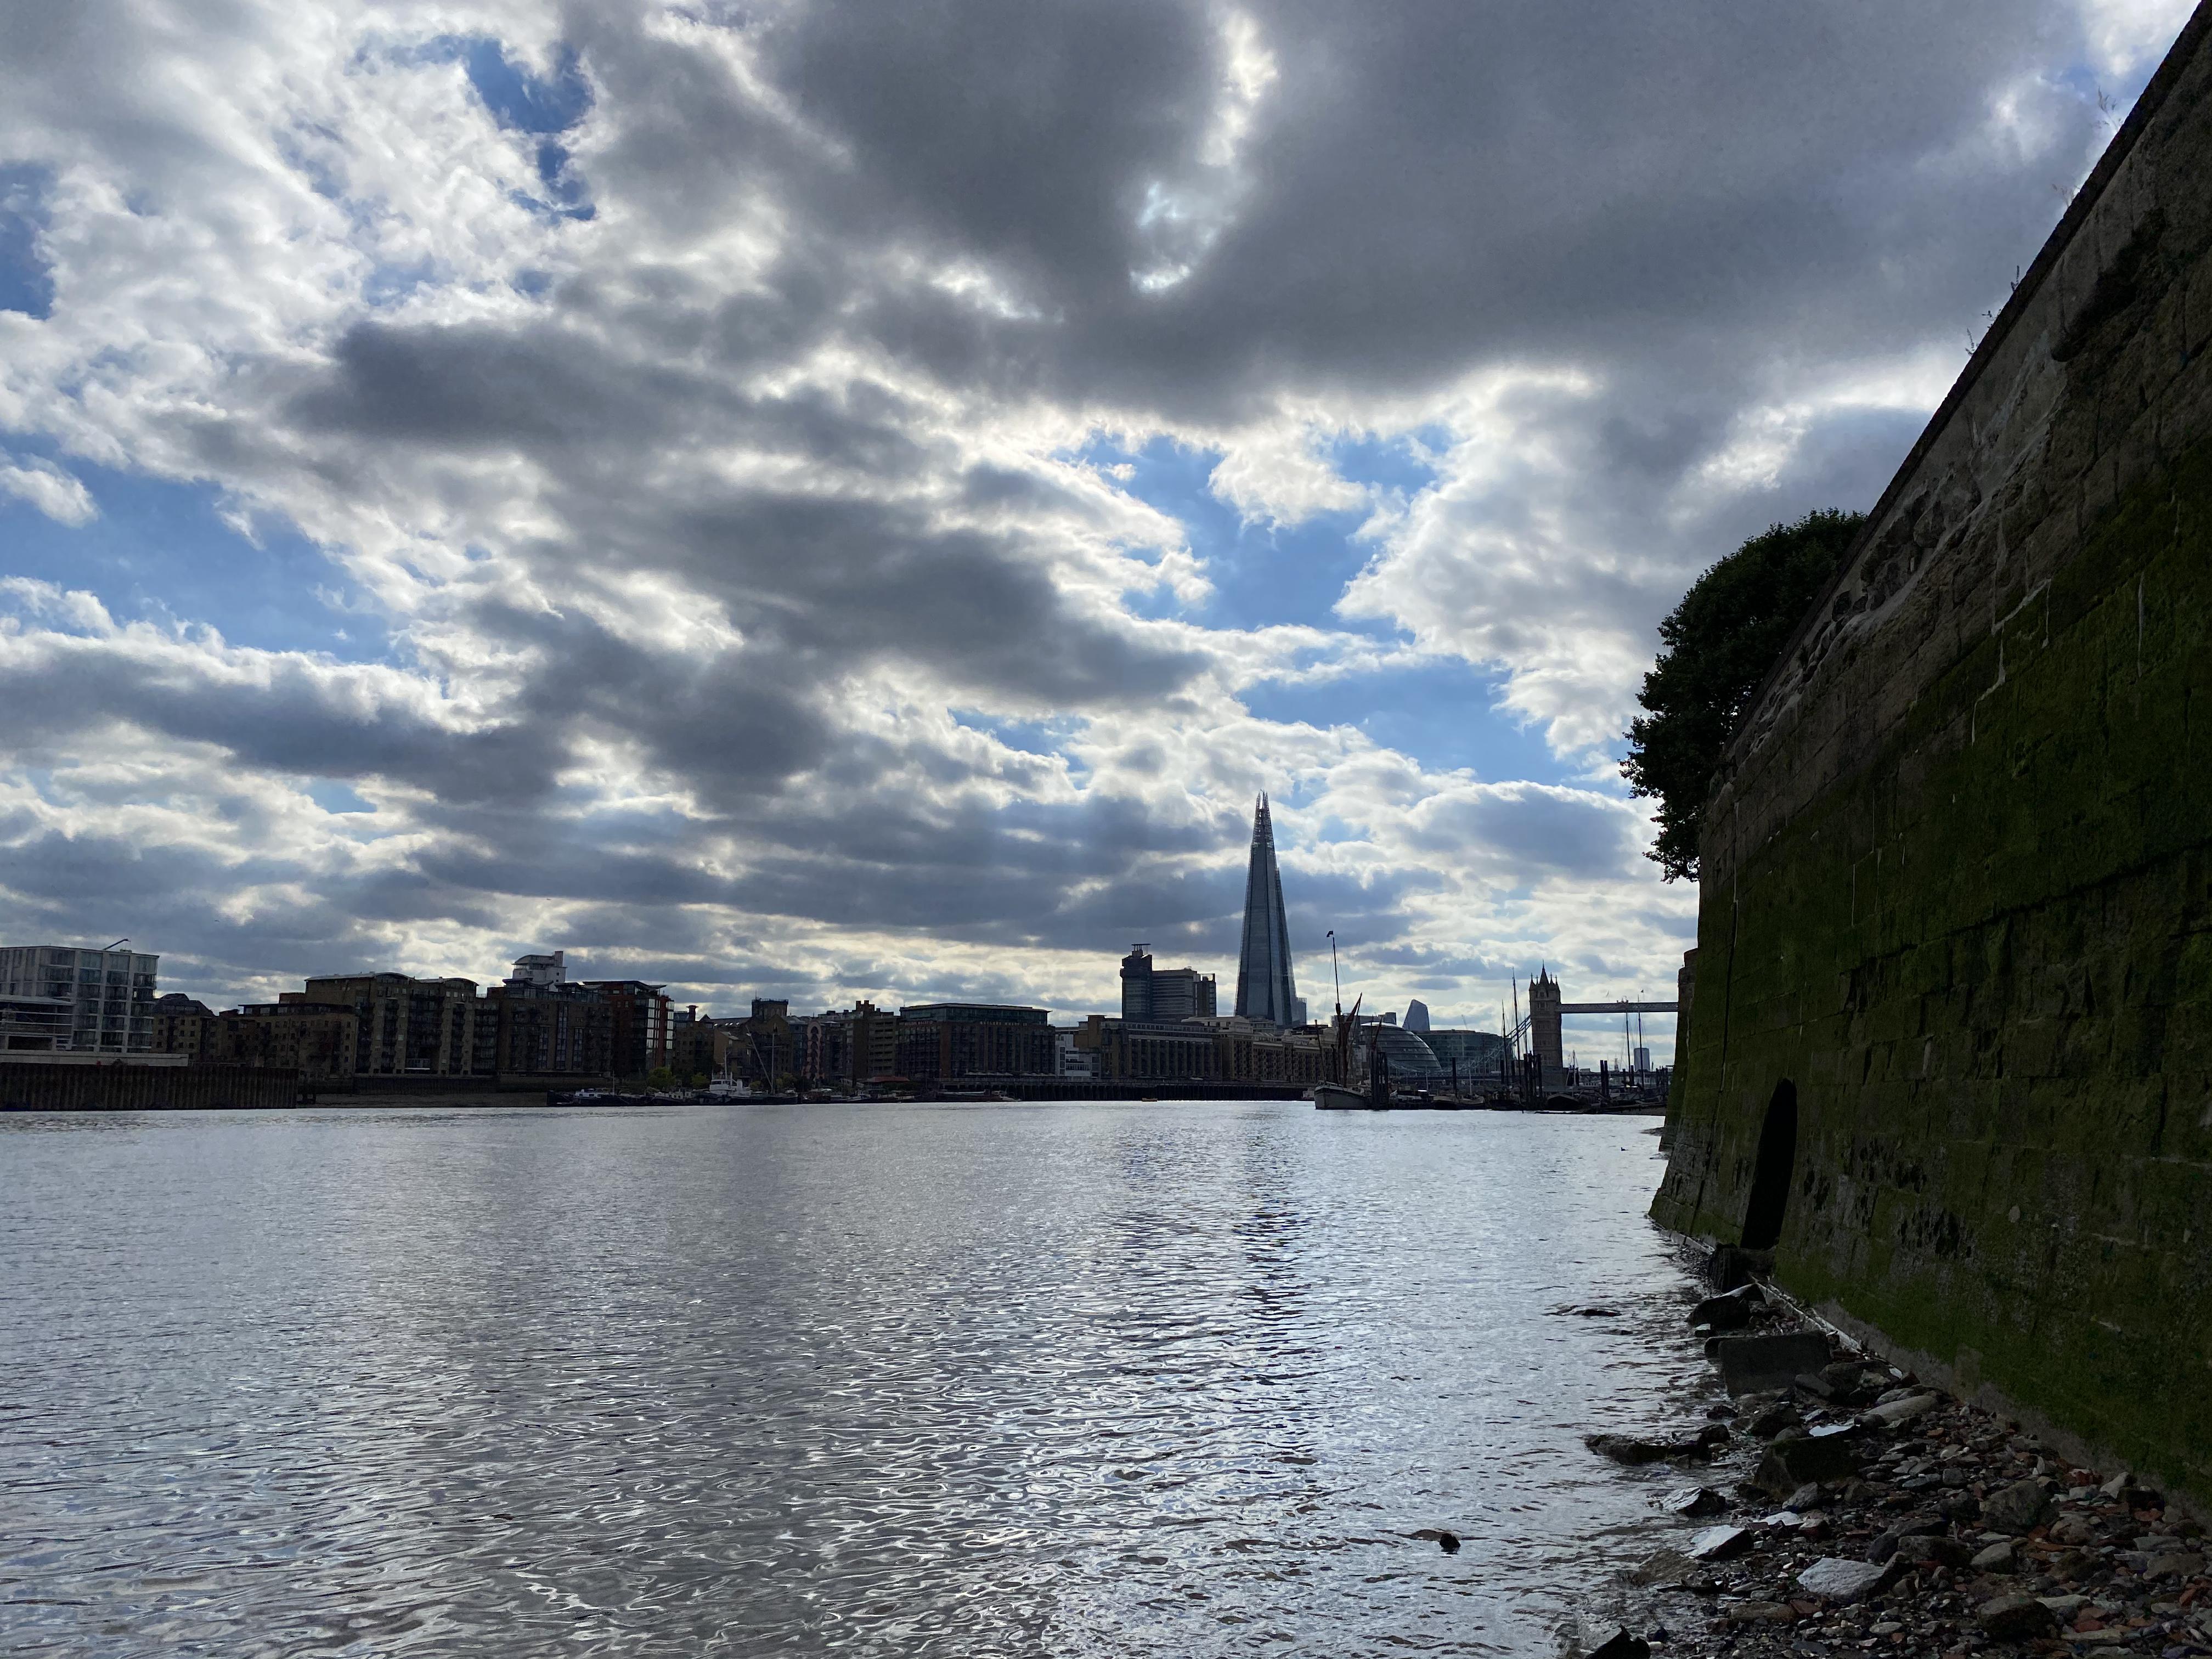 The Secrets of the London Docks